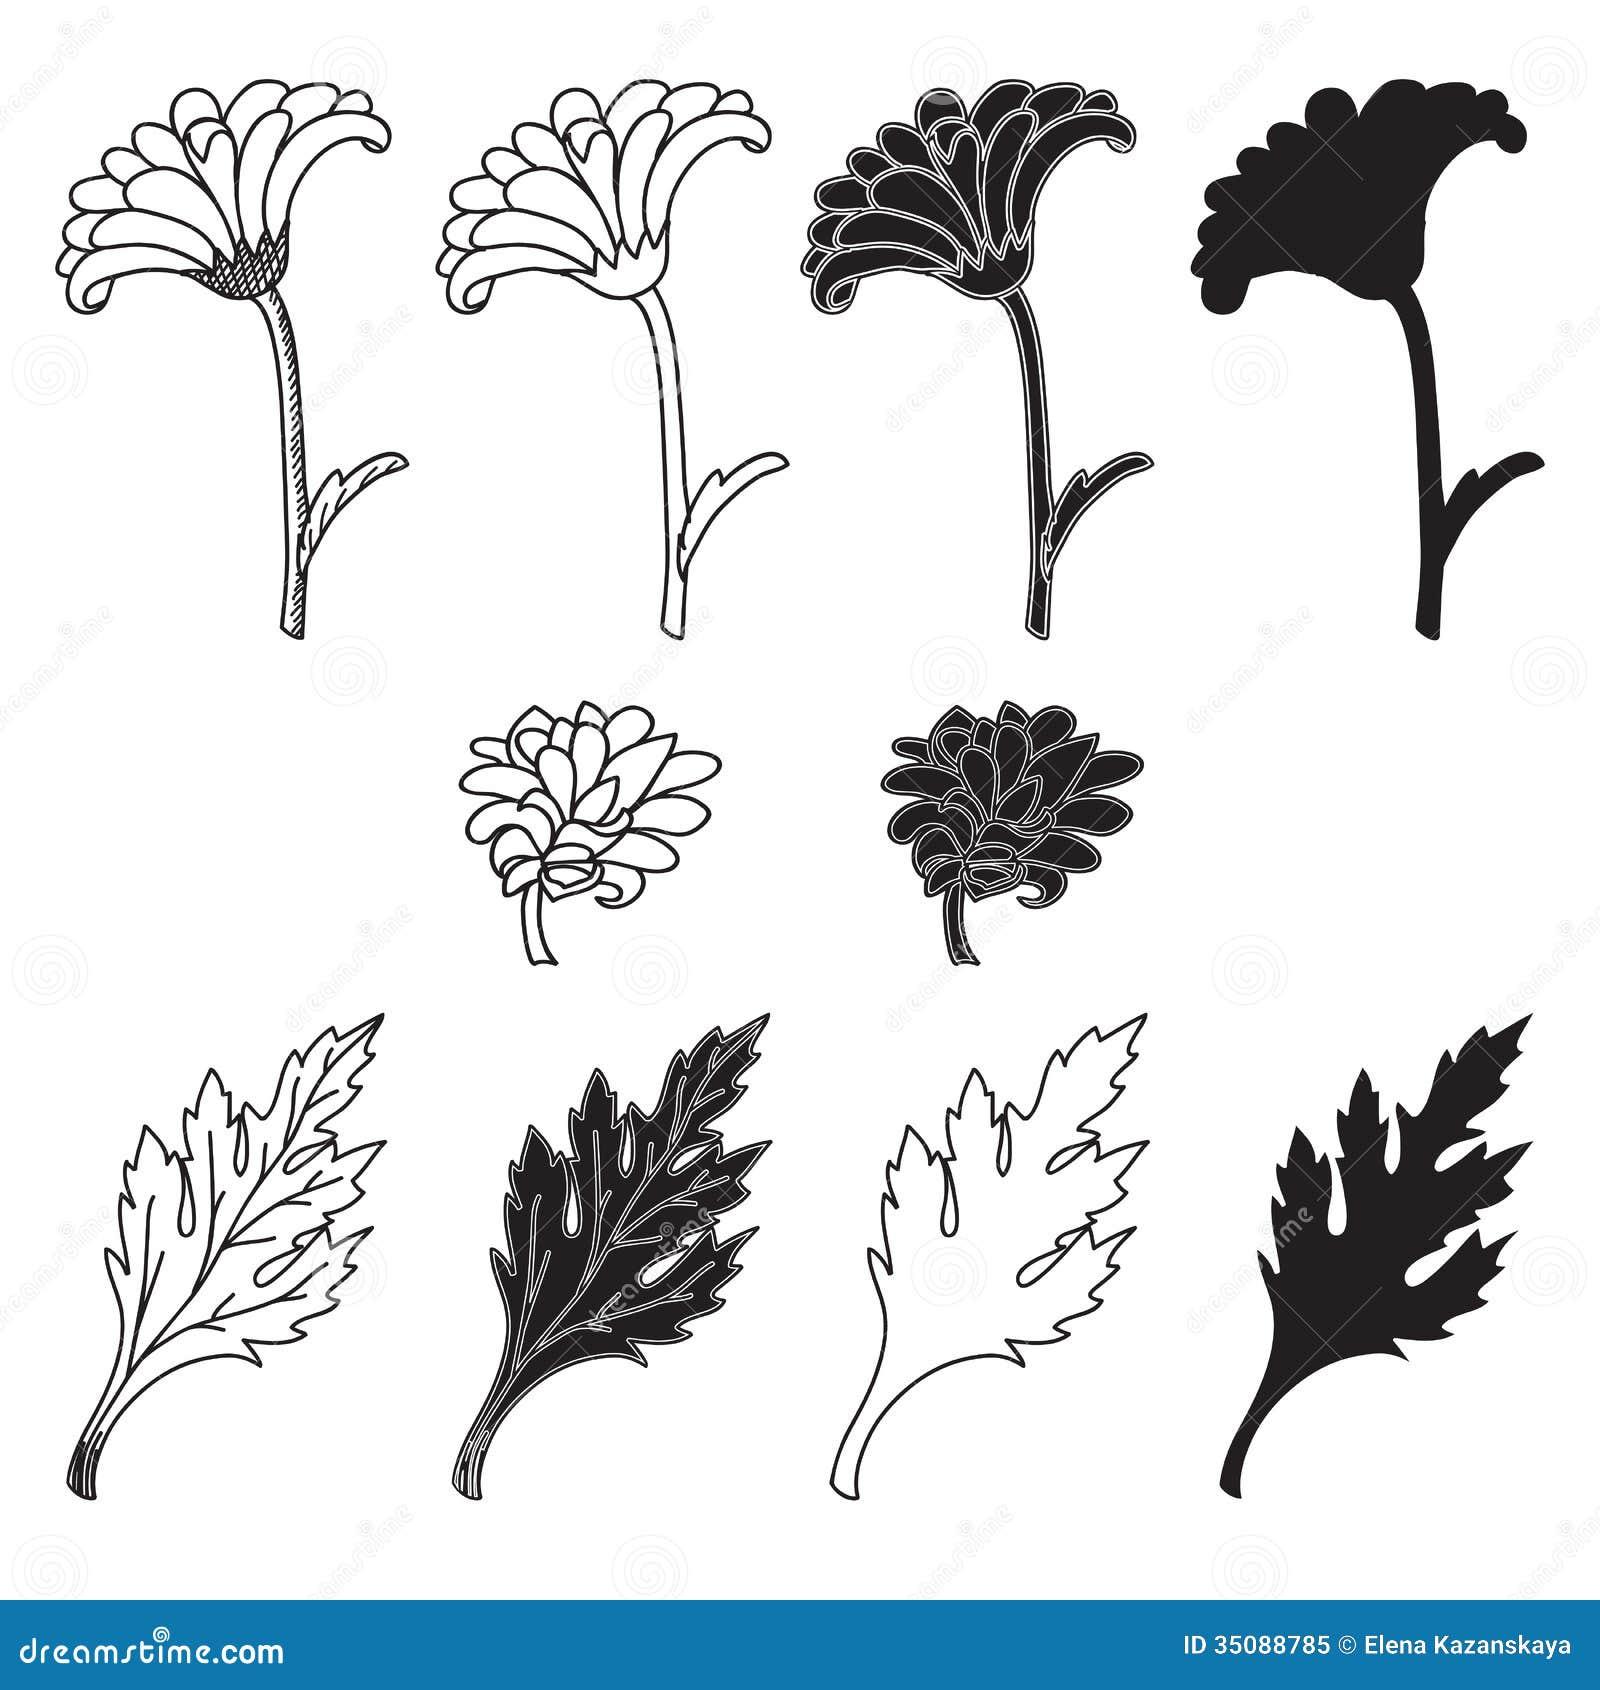 Chrysanthemum Flower Line Drawing : Chrysanthemum flowers and leaves stock vector